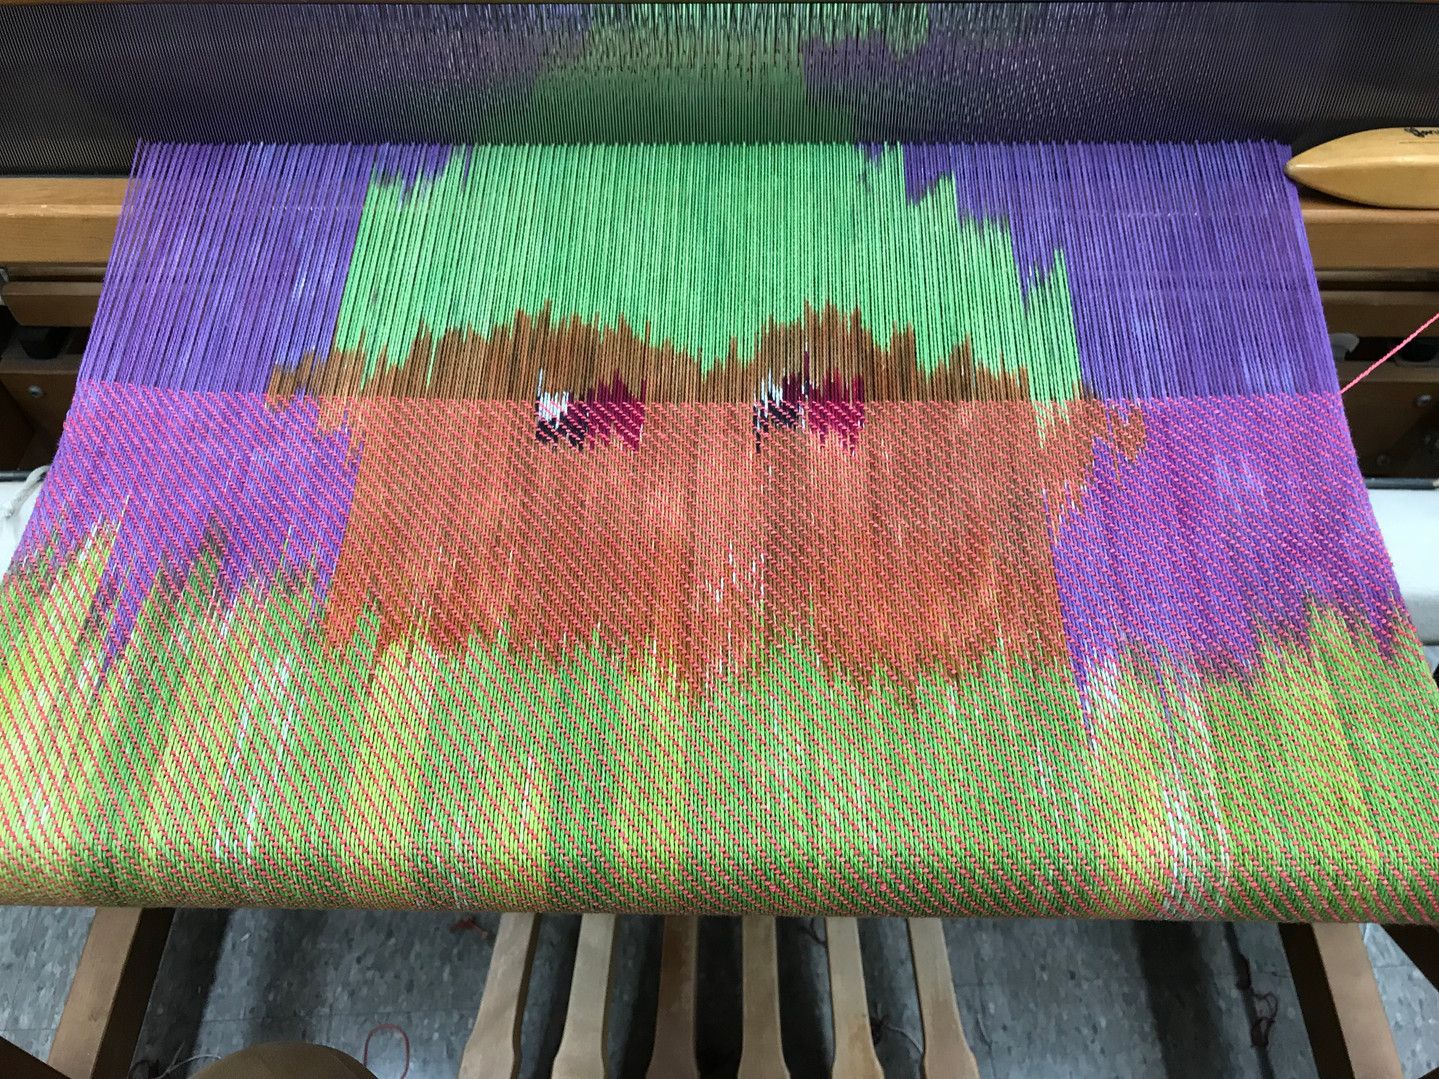 Ikat weaving